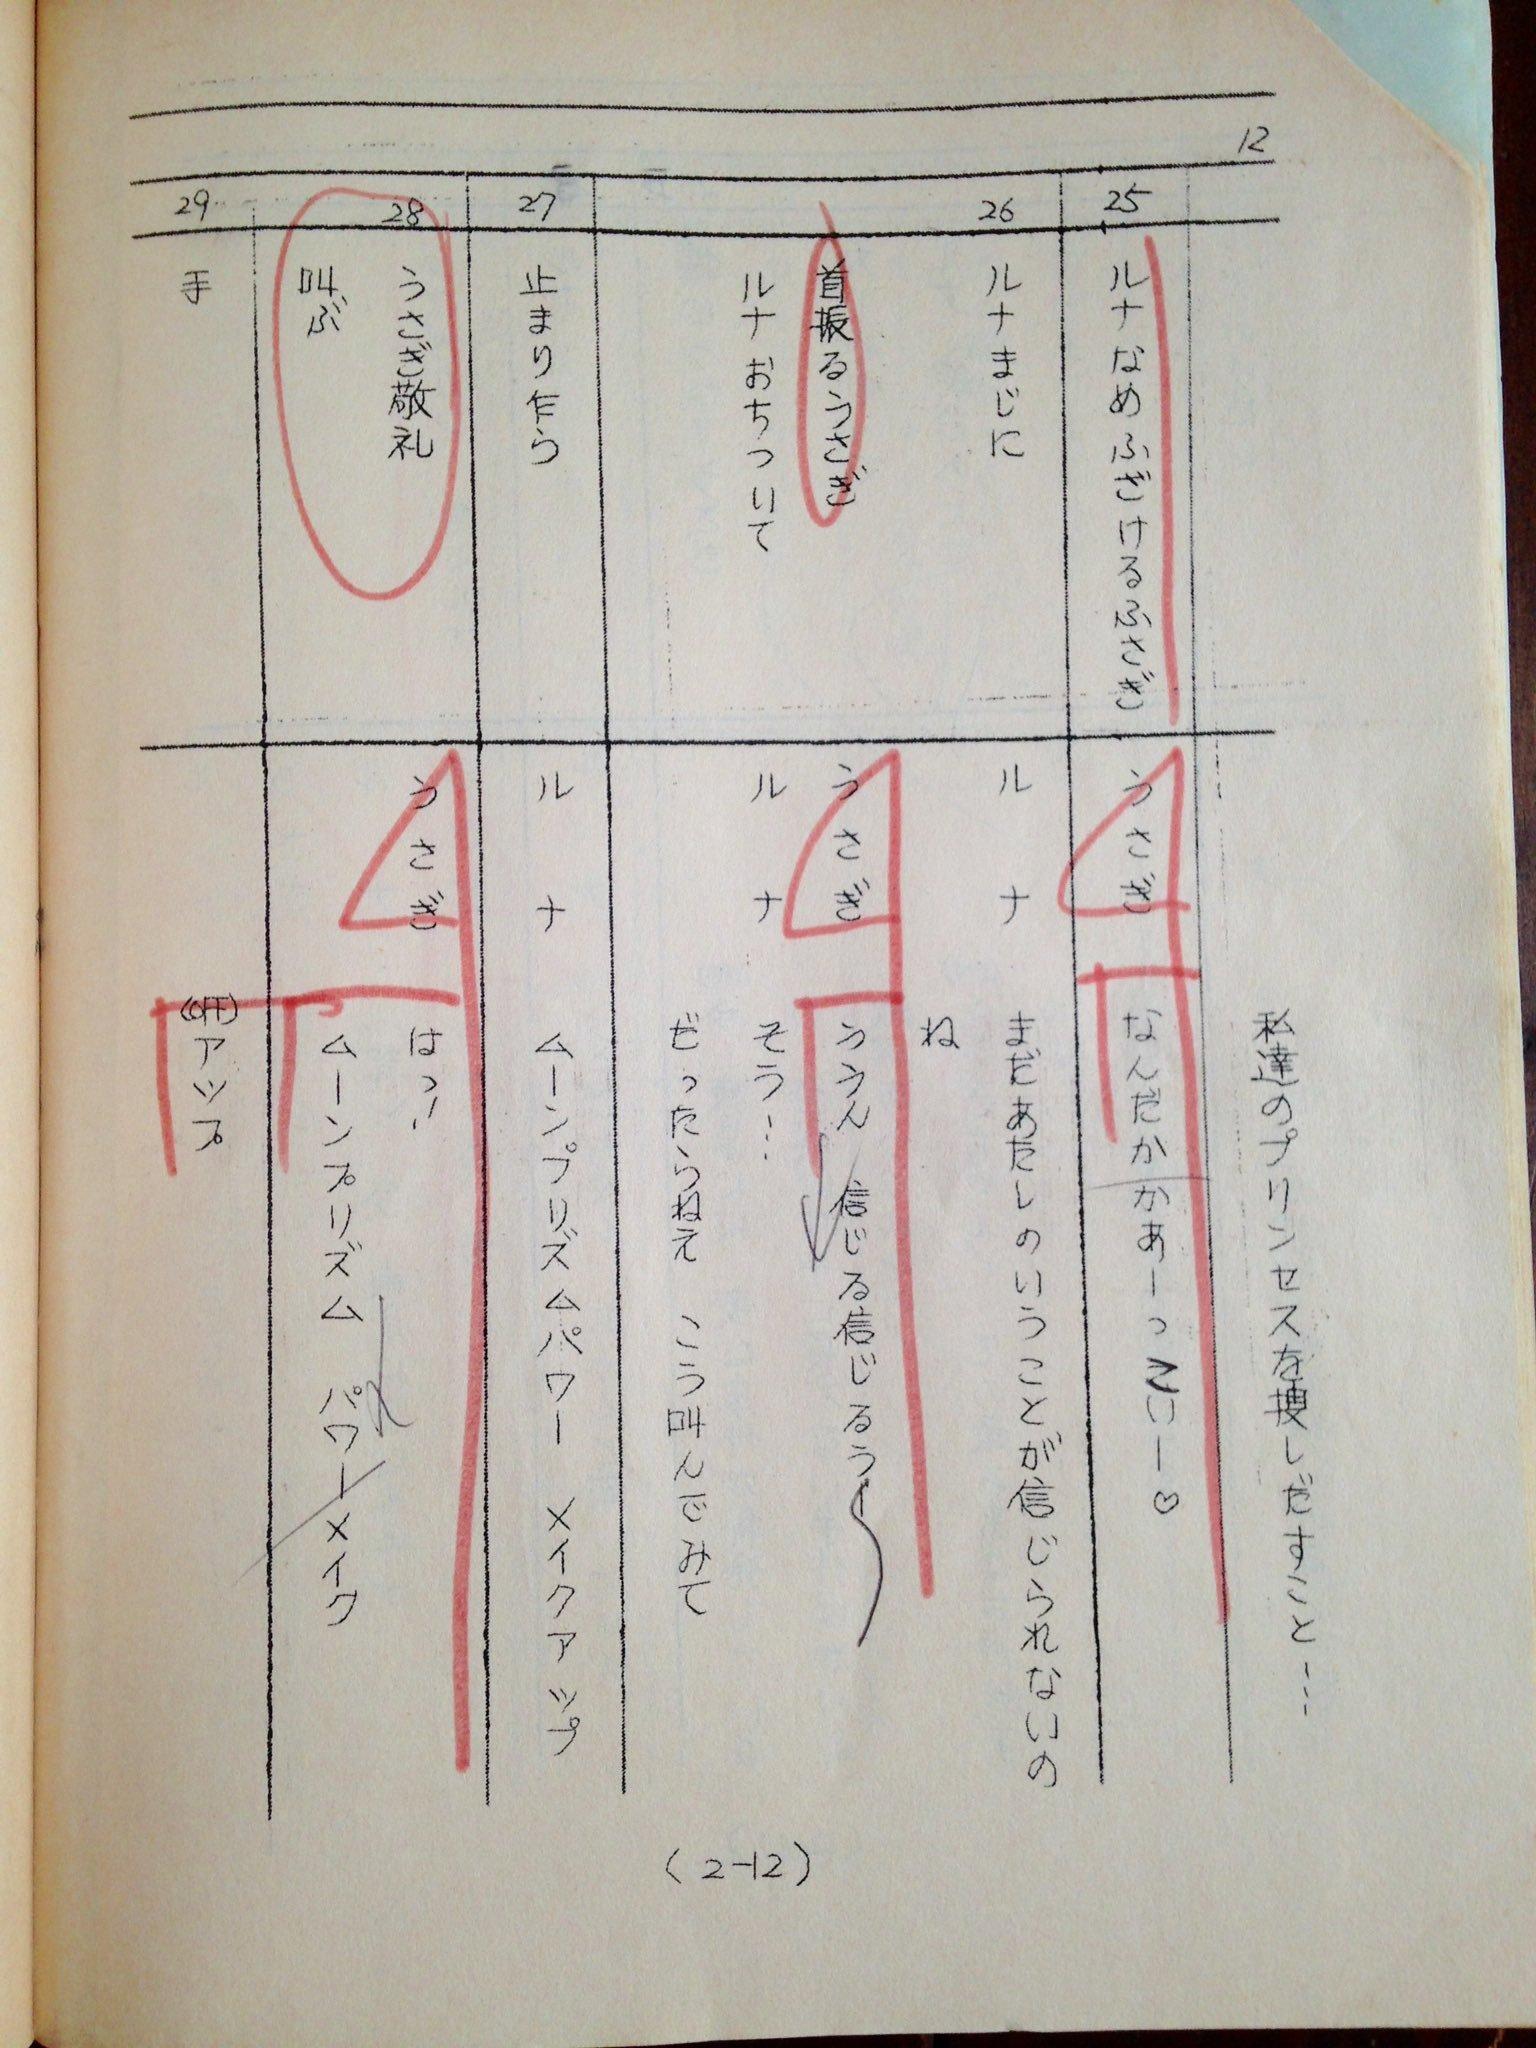 kotochawanmoon 1252454976061726720_p1 (1)